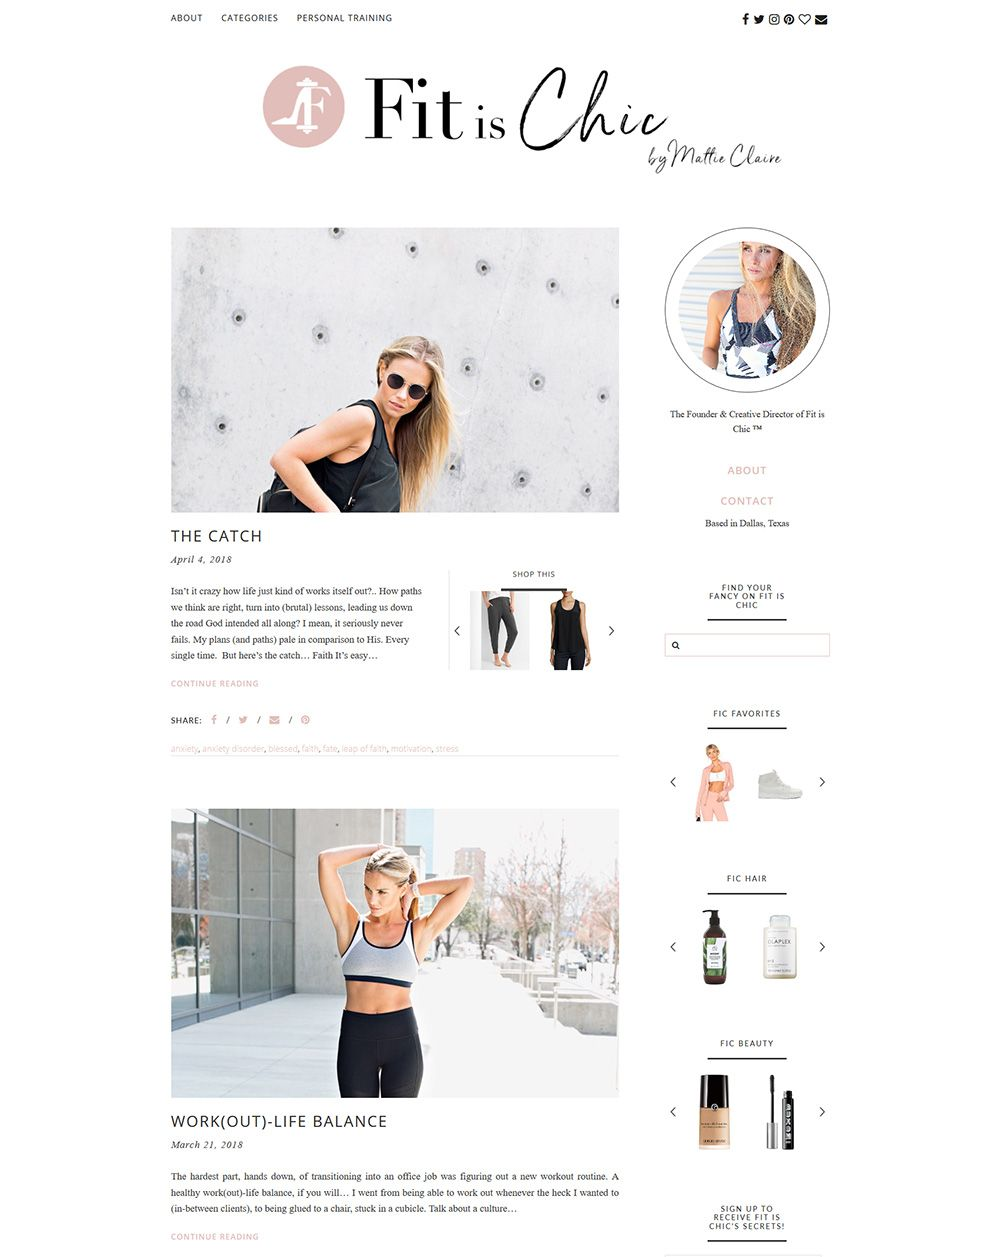 Wordpress Themes Wordpress For Beginners Web Design Inspiration Blog Design Layout Lifestyle Blog Design Ideas P